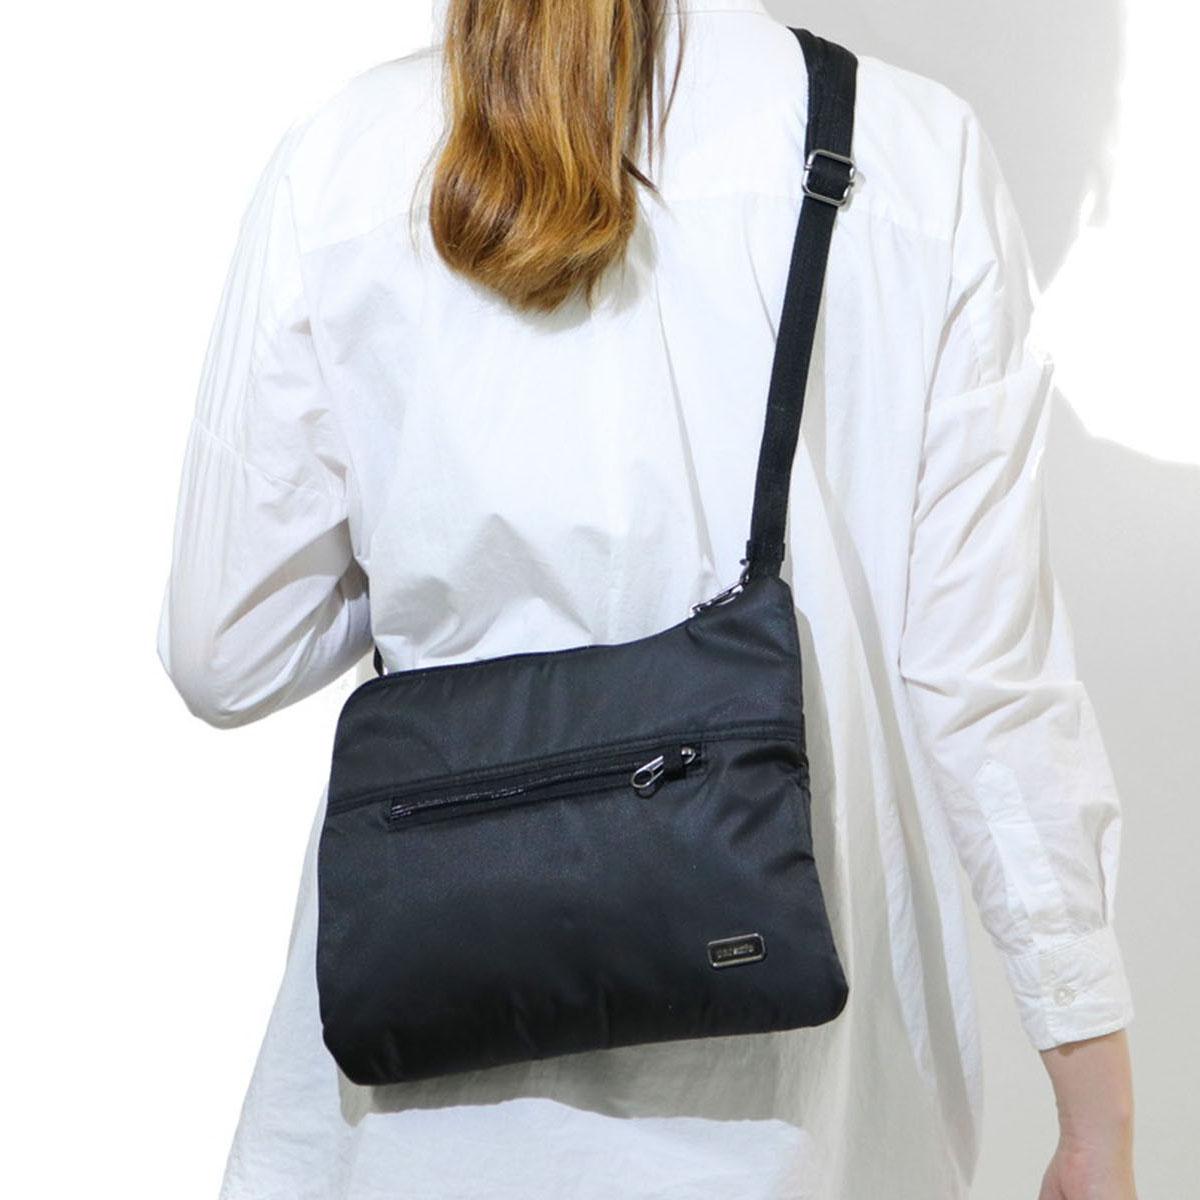 1a42e1ee6c pacsafe shoulder bag light crime prevention ladies Daysafe slim crossbody